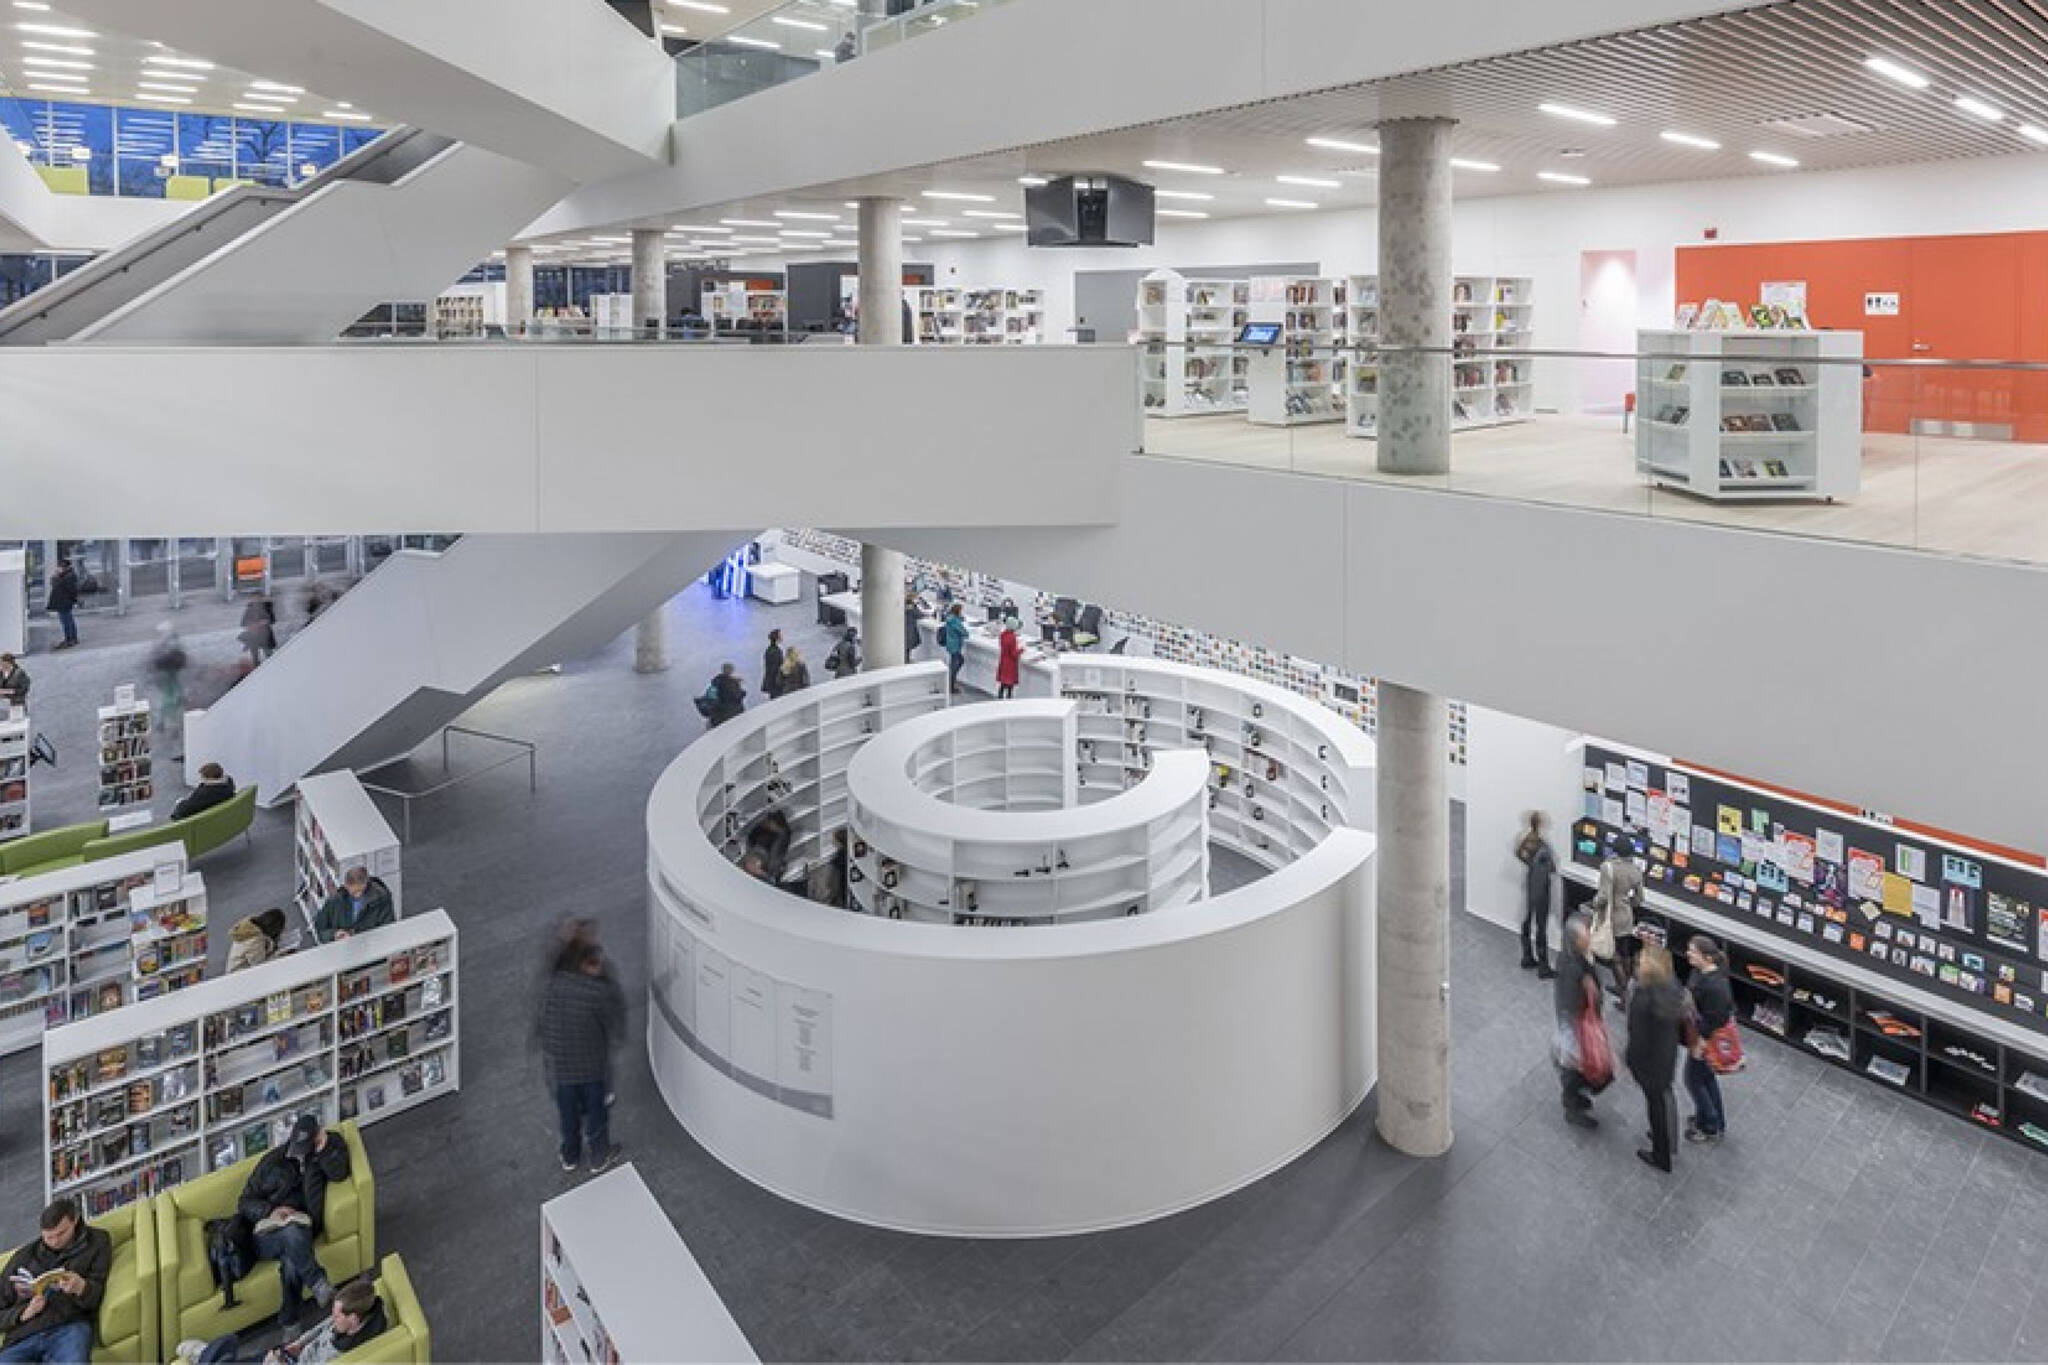 halifax public library